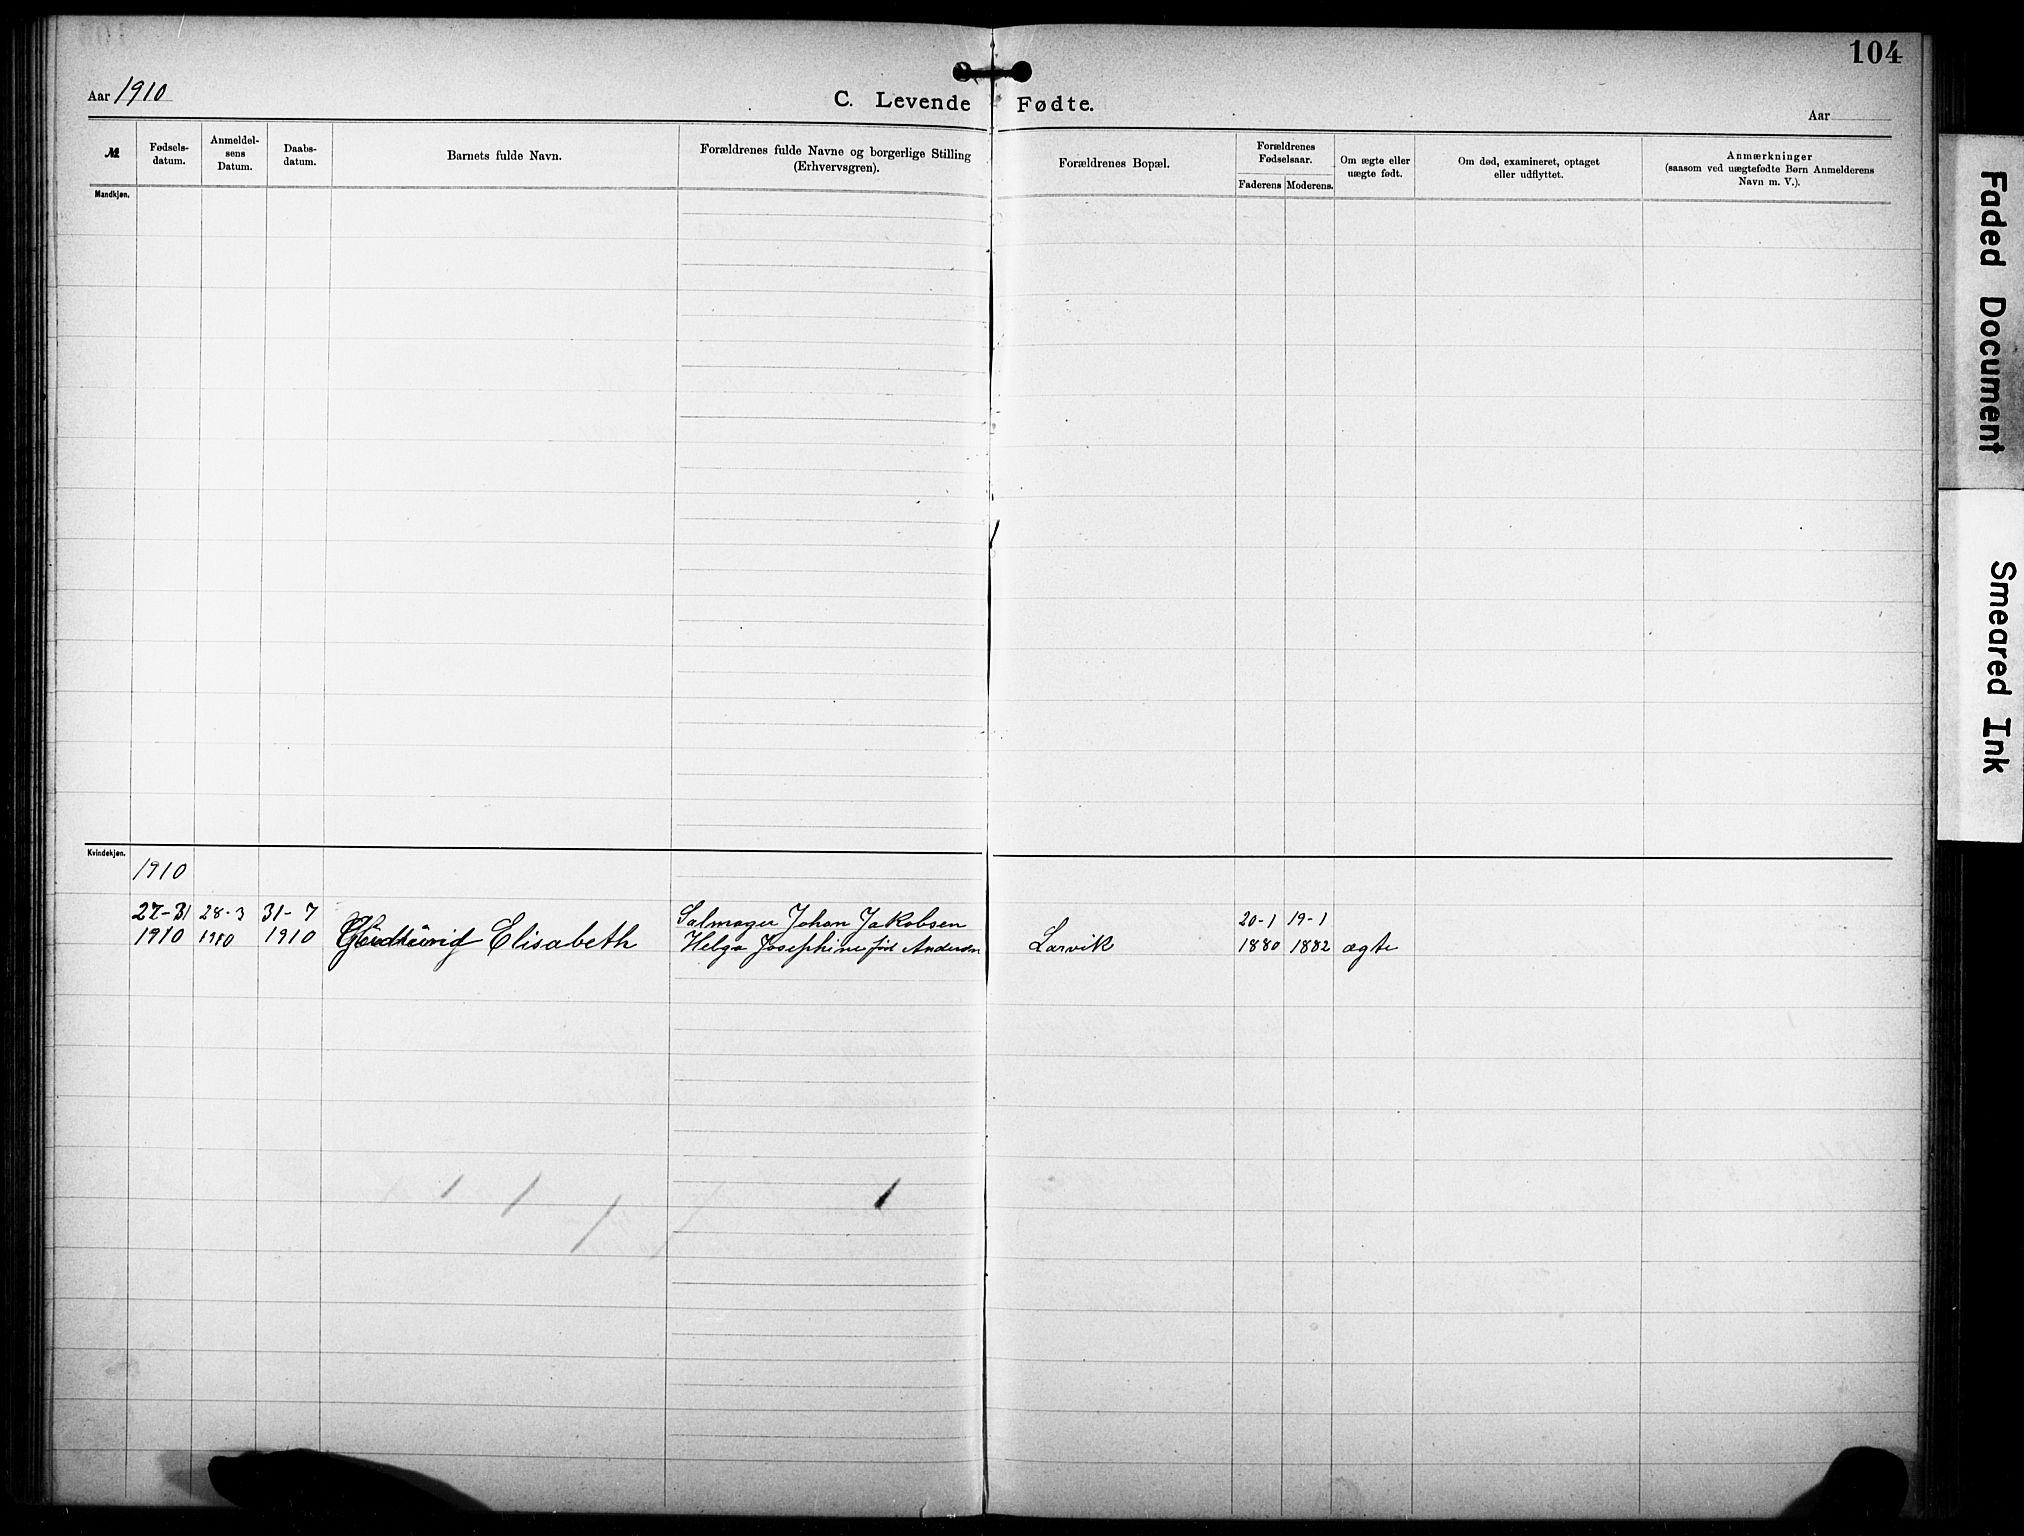 SAKO, Den katolsk-apostoliske menighet i Larvik, F/Fa/L0001: Dissenterprotokoll nr. 1, 1892-1933, s. 104